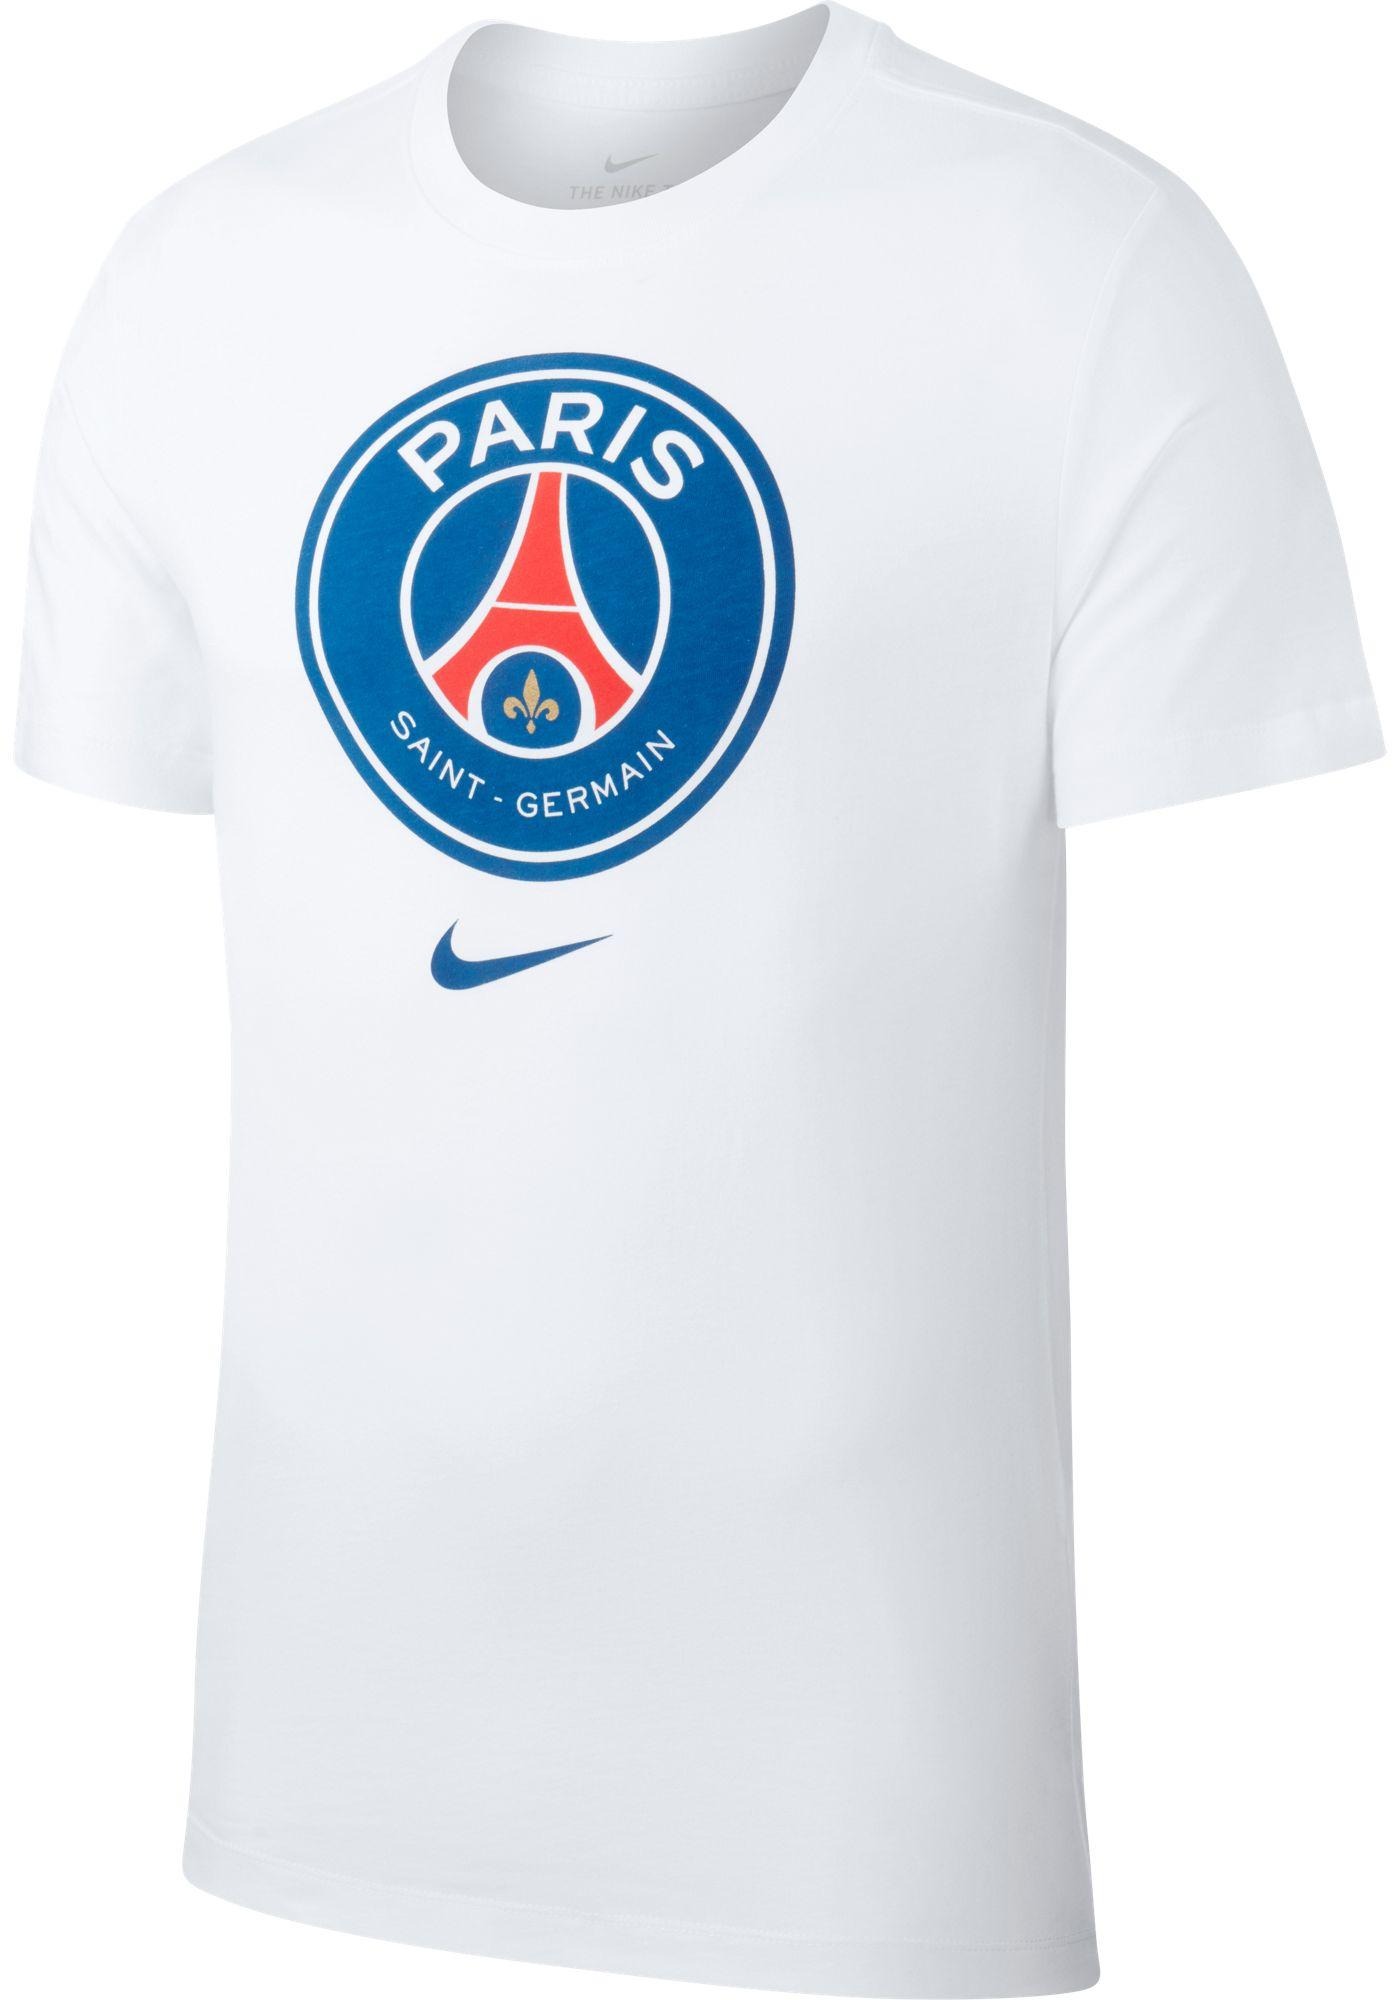 Nike Men's Paris Saint-Germain Crest White T-Shirt